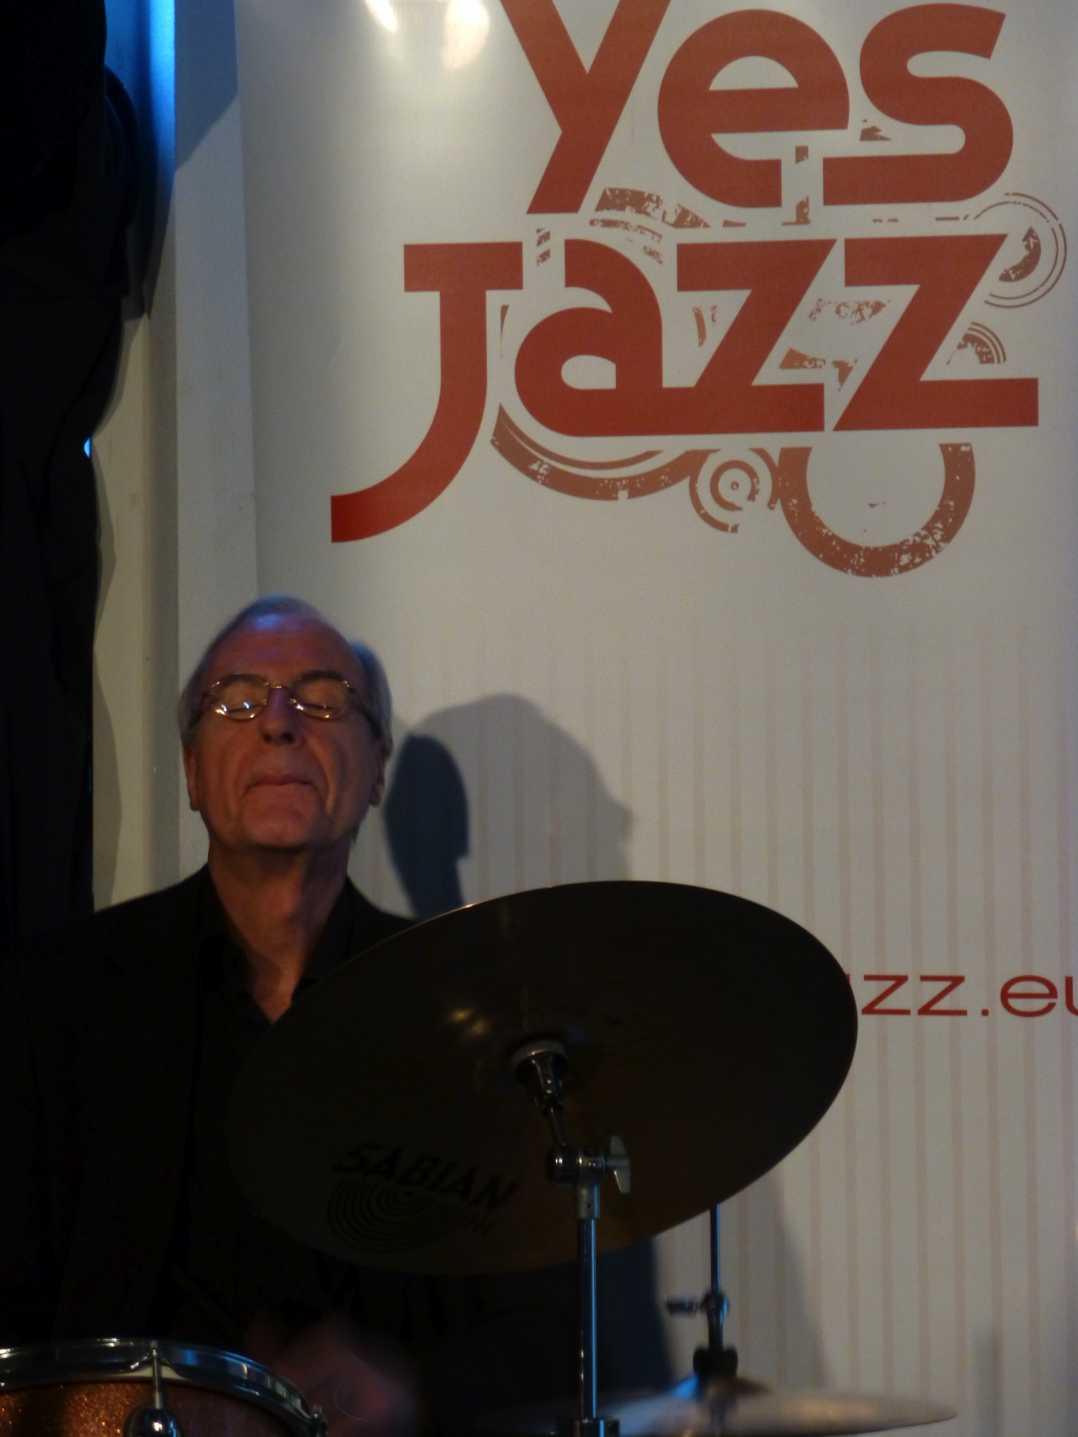 Ellister van der Molen Kwartet 13 jan 2013-5